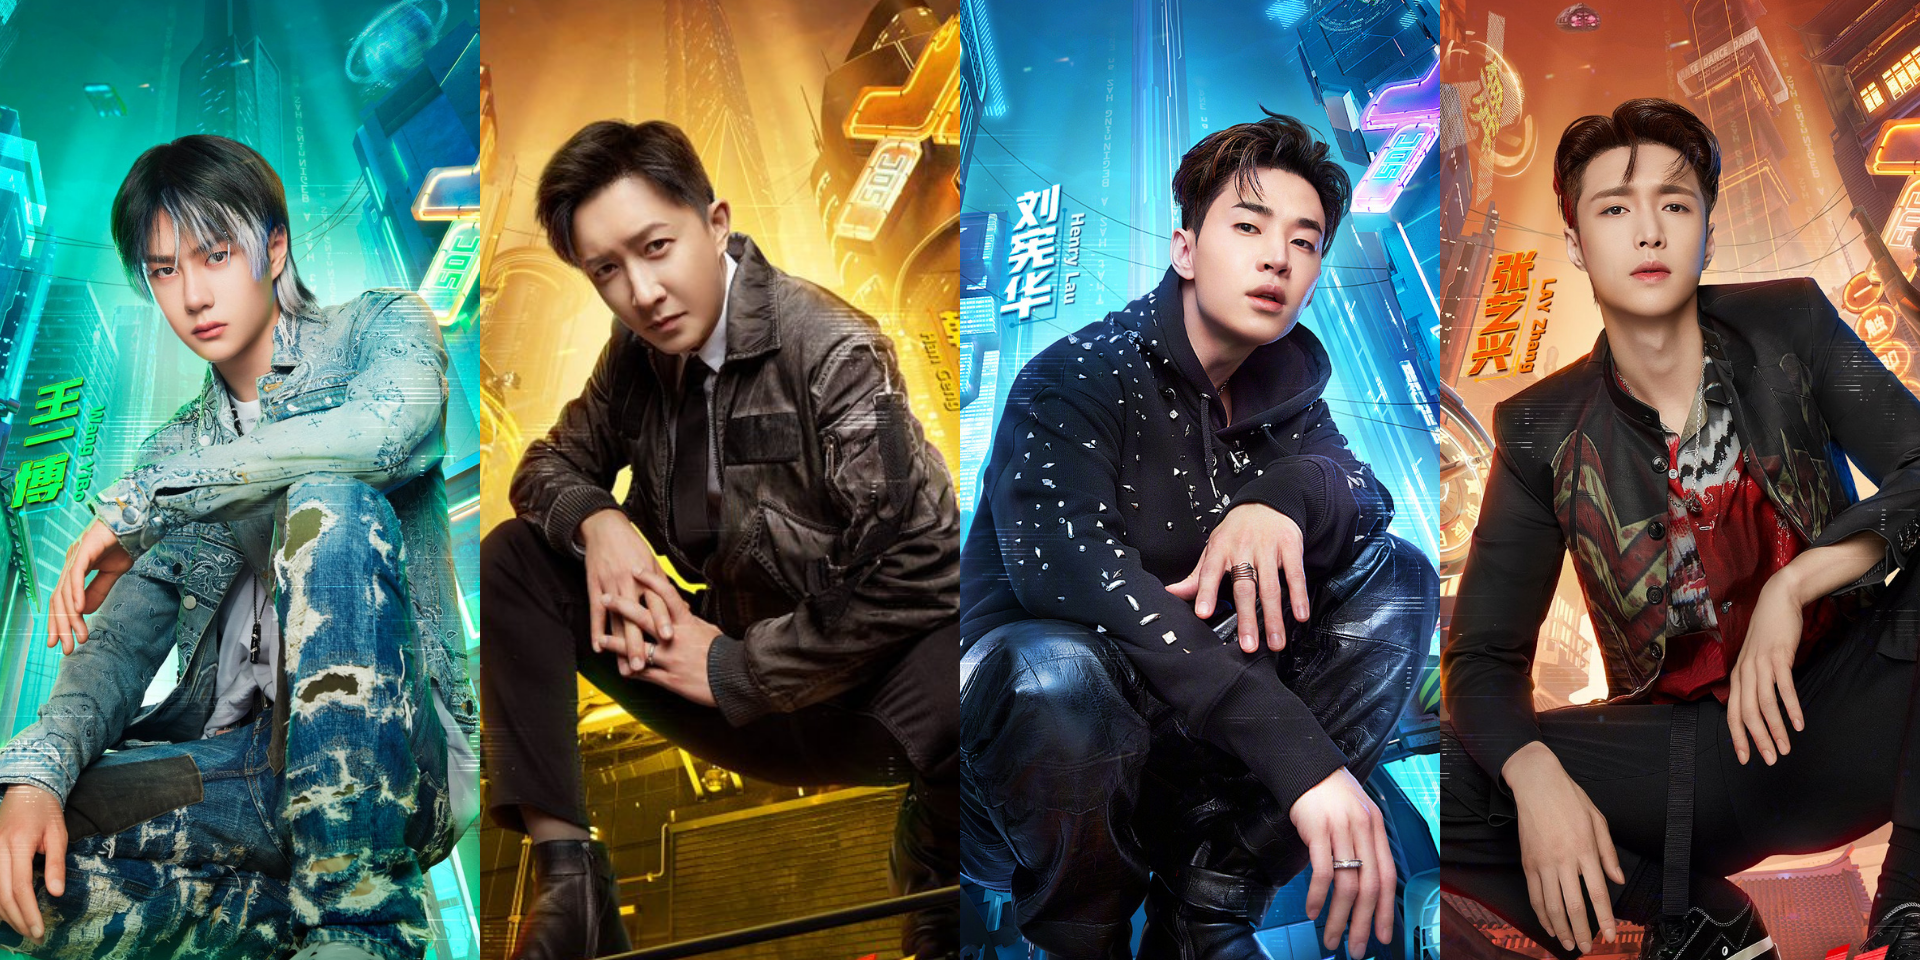 Wang Yibo, Han Geng, Henry Lau, and Lay Zhang announced as captains for Street Dance of China Season 4